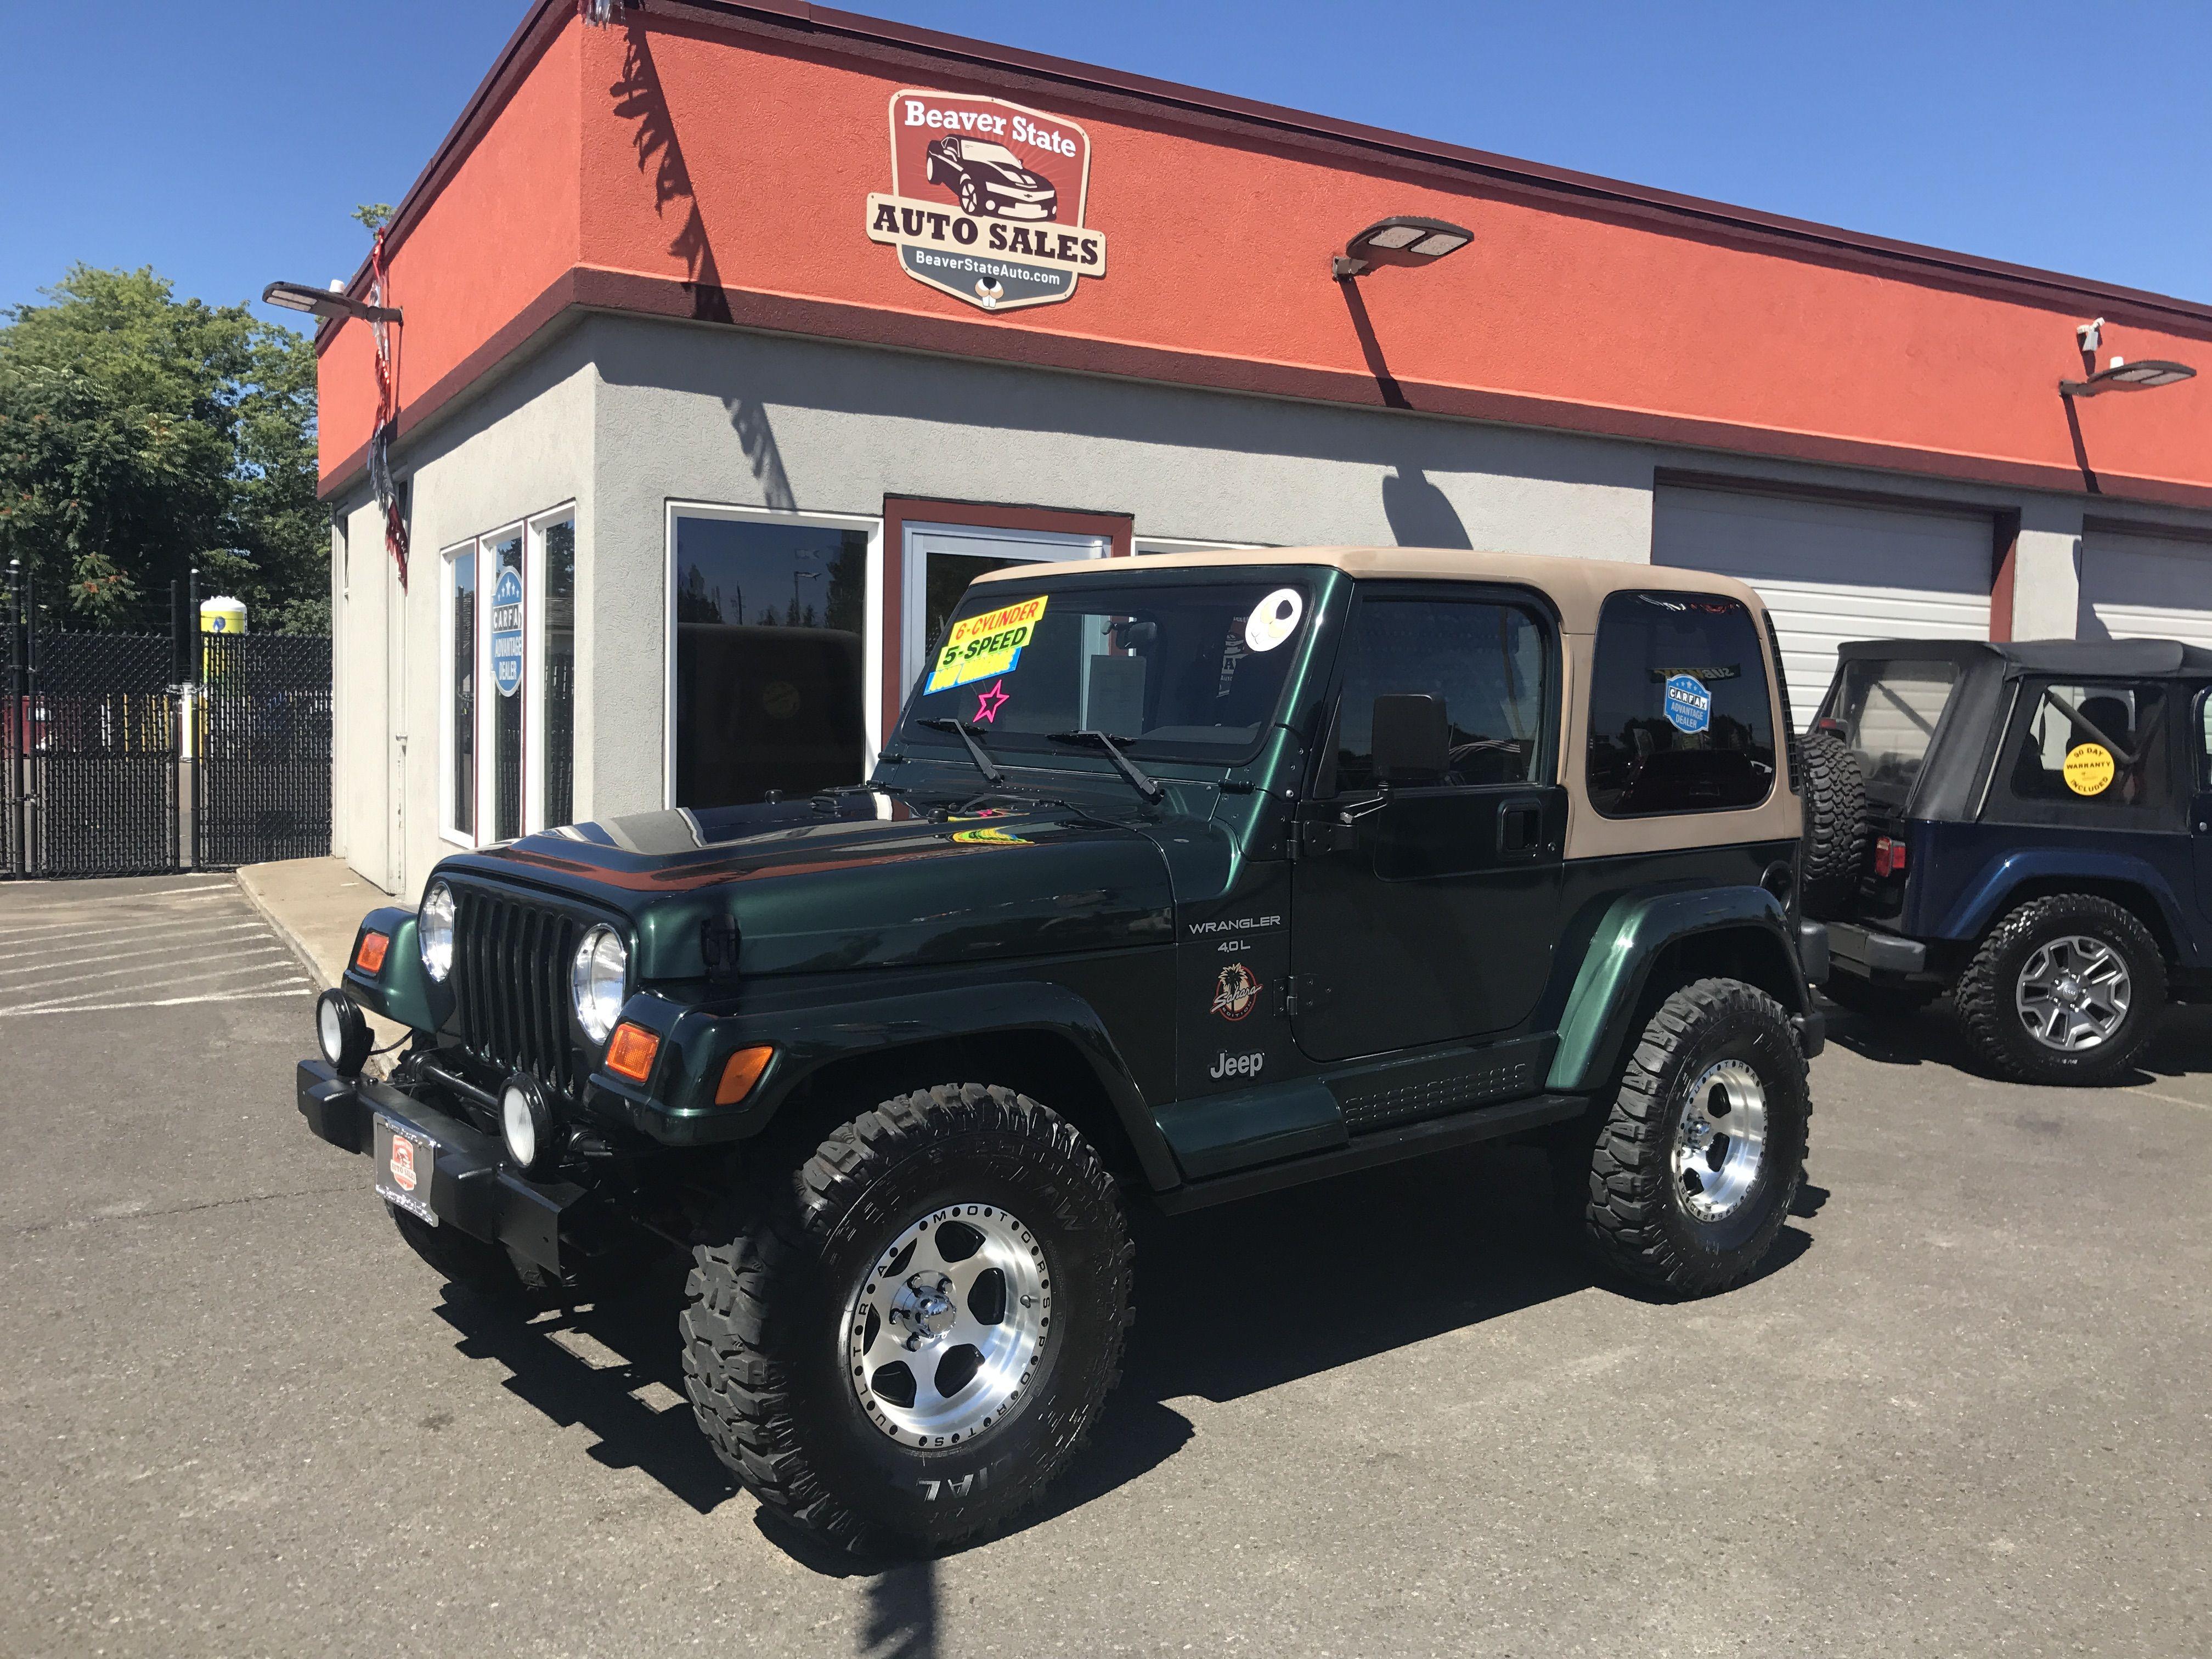 1999 Jeep Wrangler Sahara 1999 Jeep Wrangler Jeep Wrangler